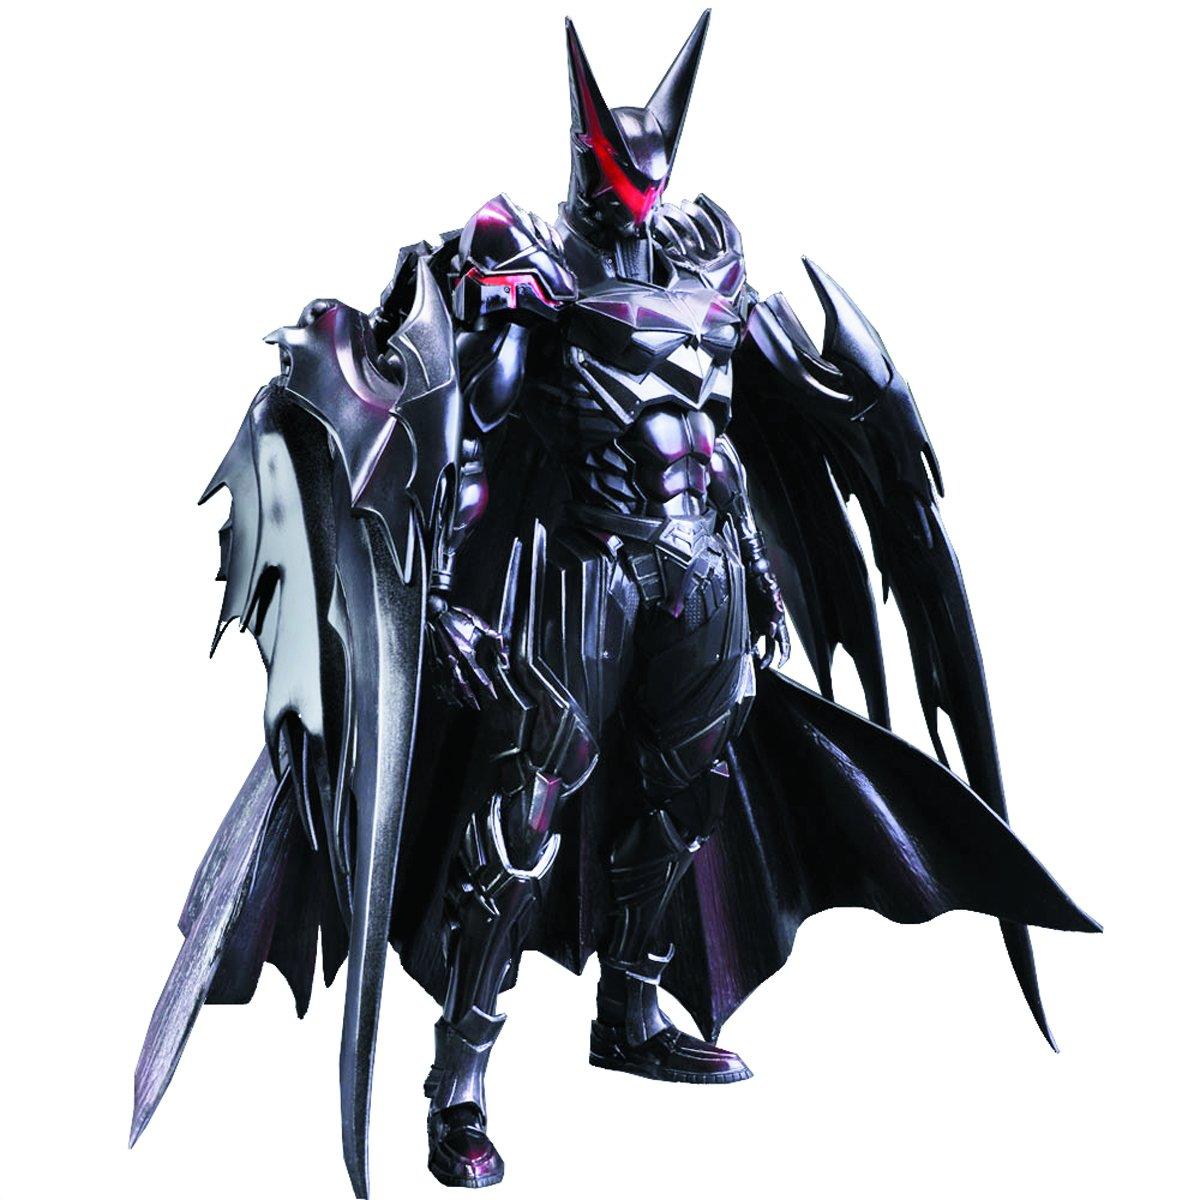 Square Enix DC Comics Variant Play Arts Kai Batman (Tetsuya Version) Action Figure